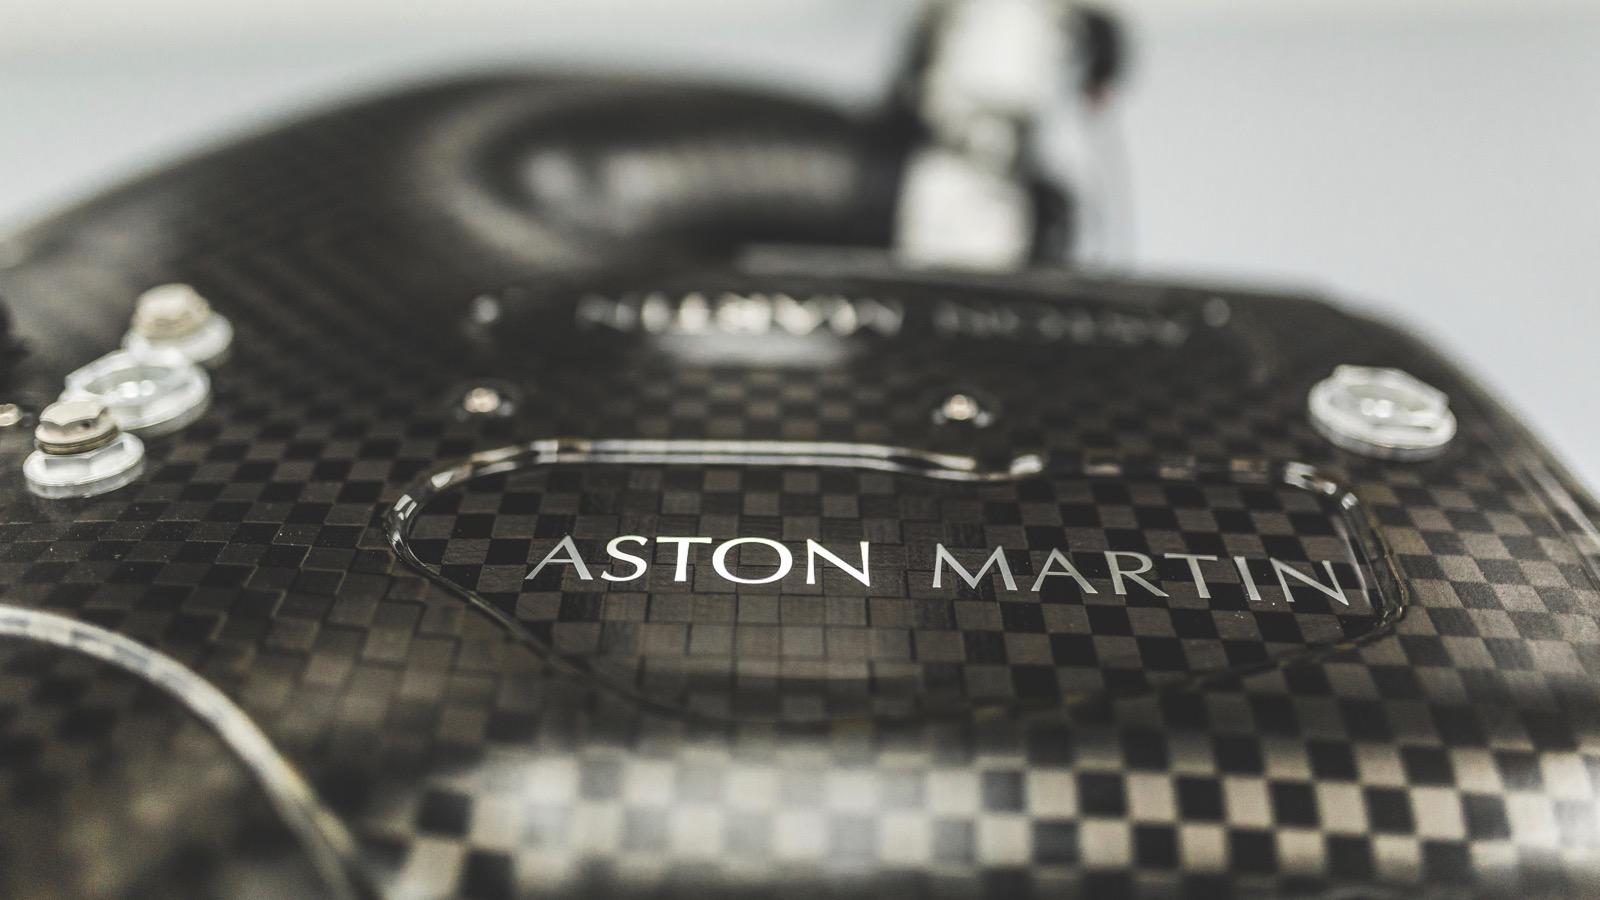 Aston Martin developing new hybrid engine